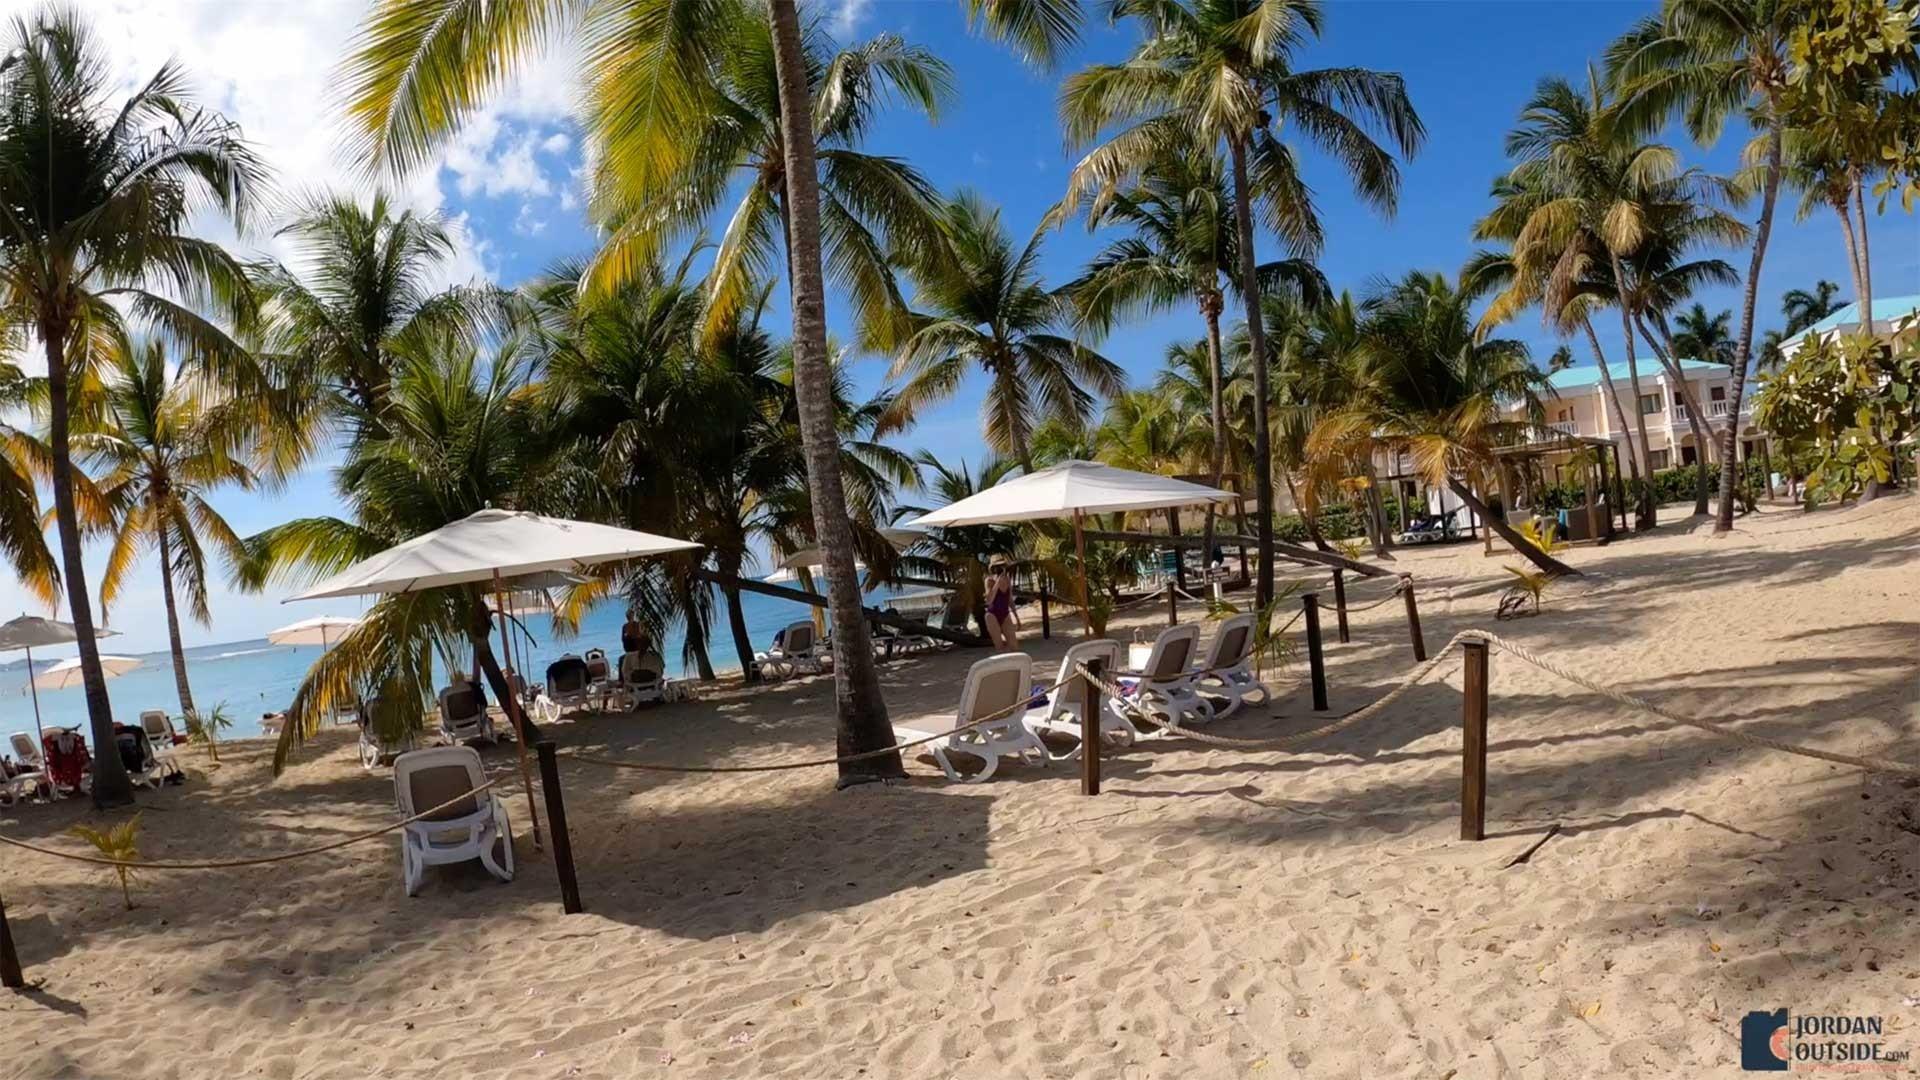 Palm Trees at Mermaid Beach